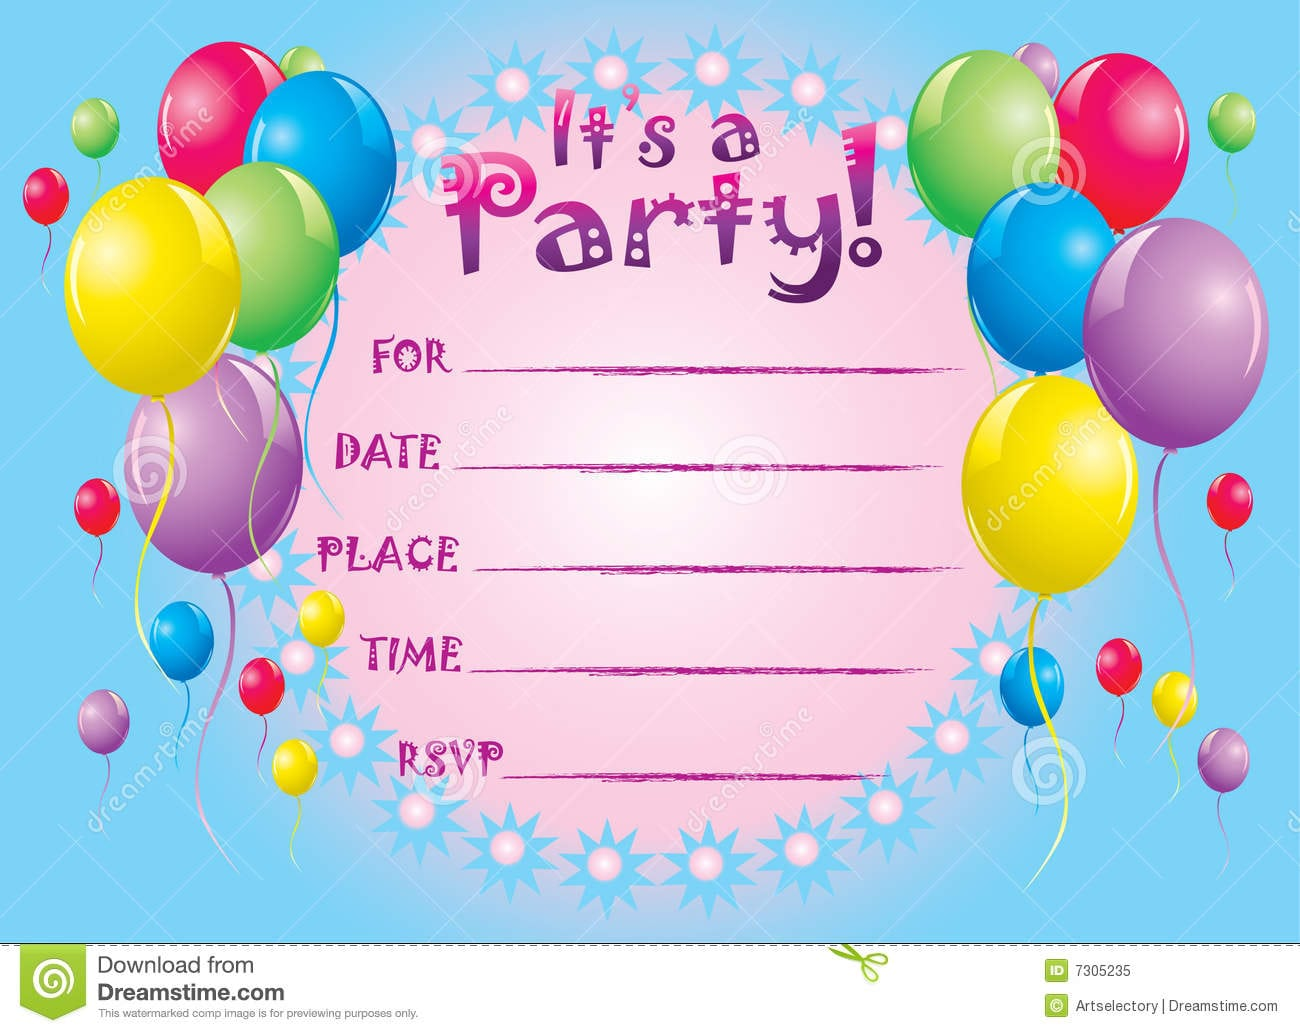 Invitation Card For Birthday